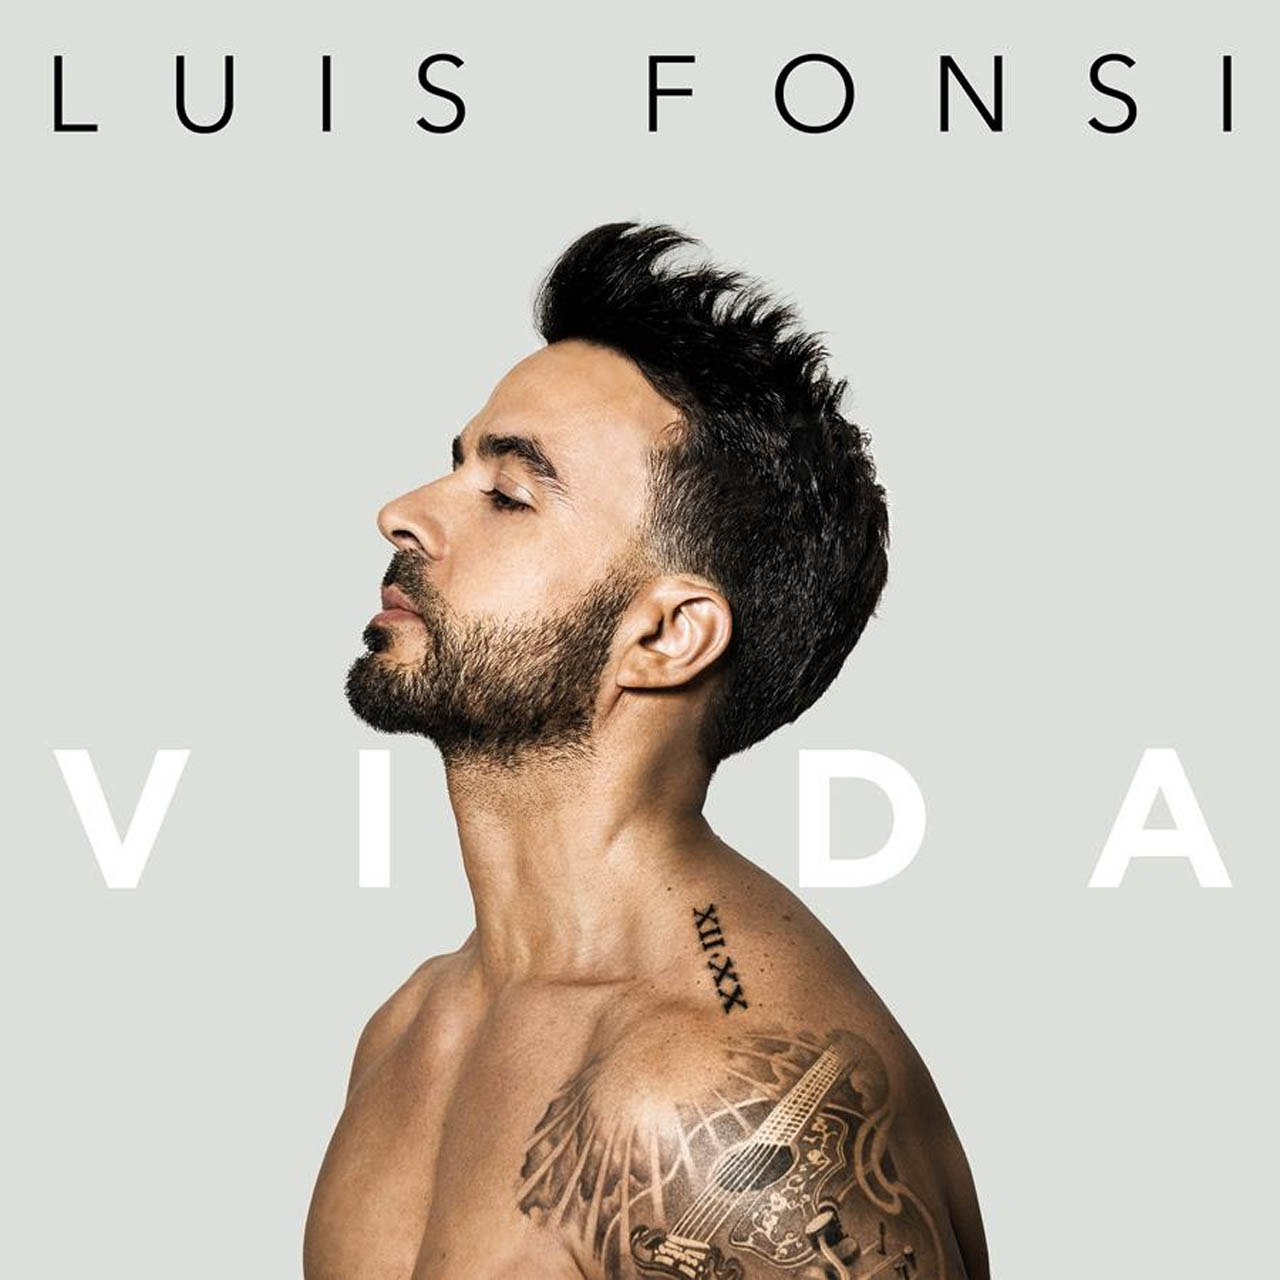 Luis Fonsi - Vida